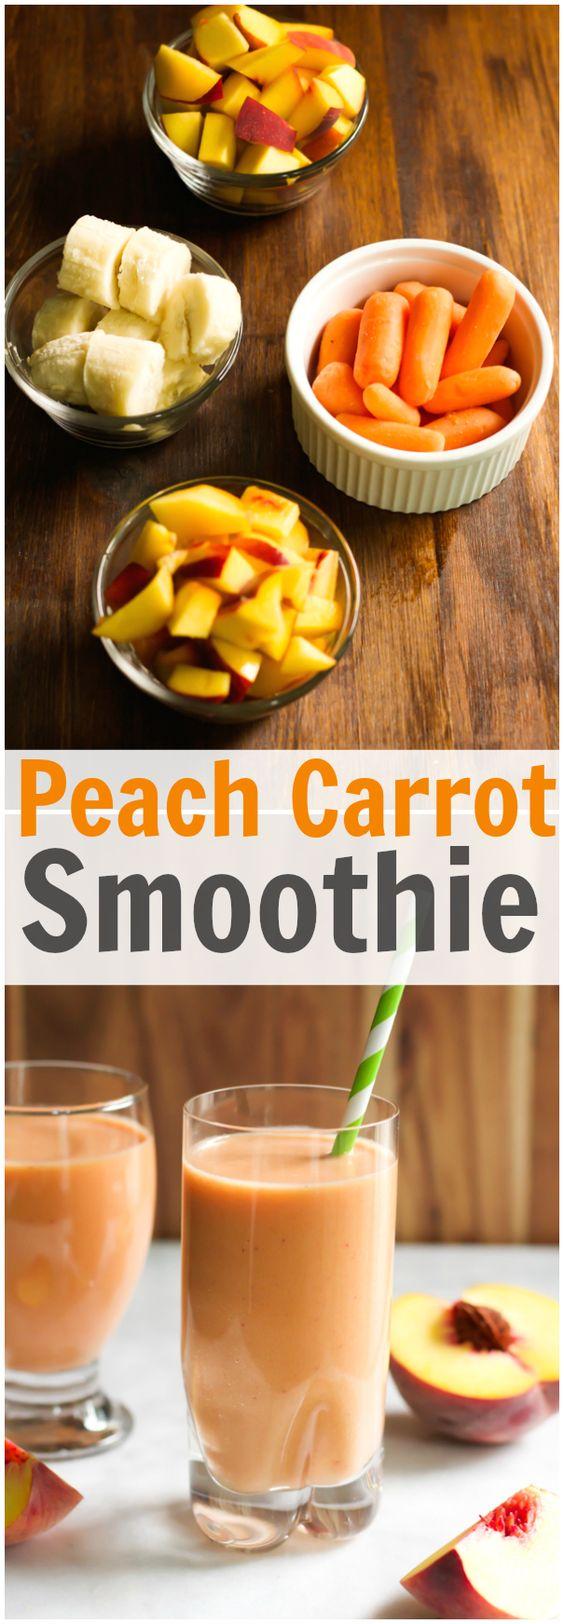 Peach Carrot Smoothie Recipe